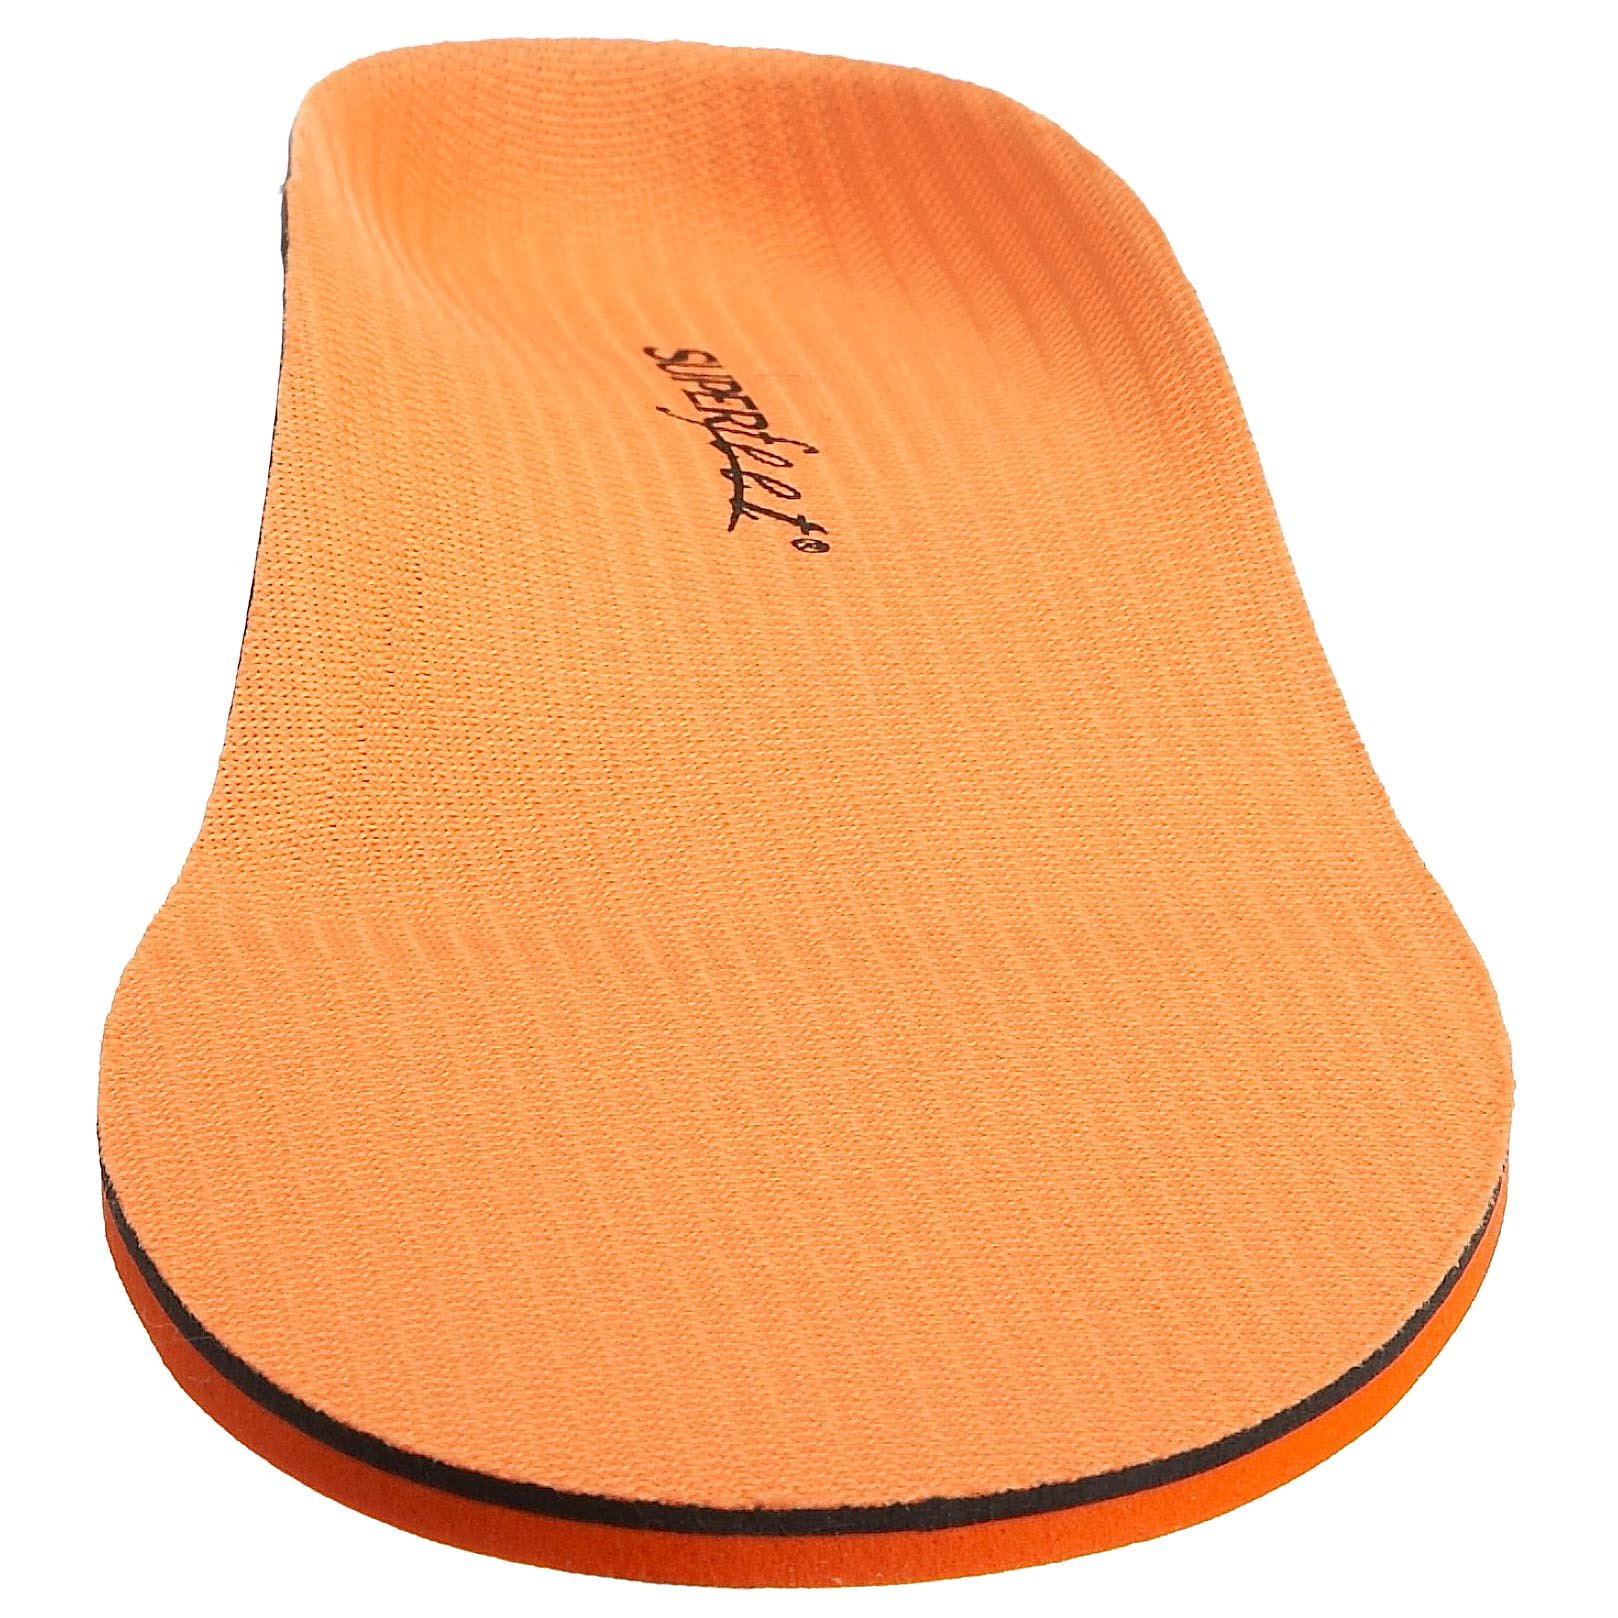 Superfeet Men's Orange Premium Insoles,Orange,C: 5.5-7 US Mens by Superfeet (Image #4)